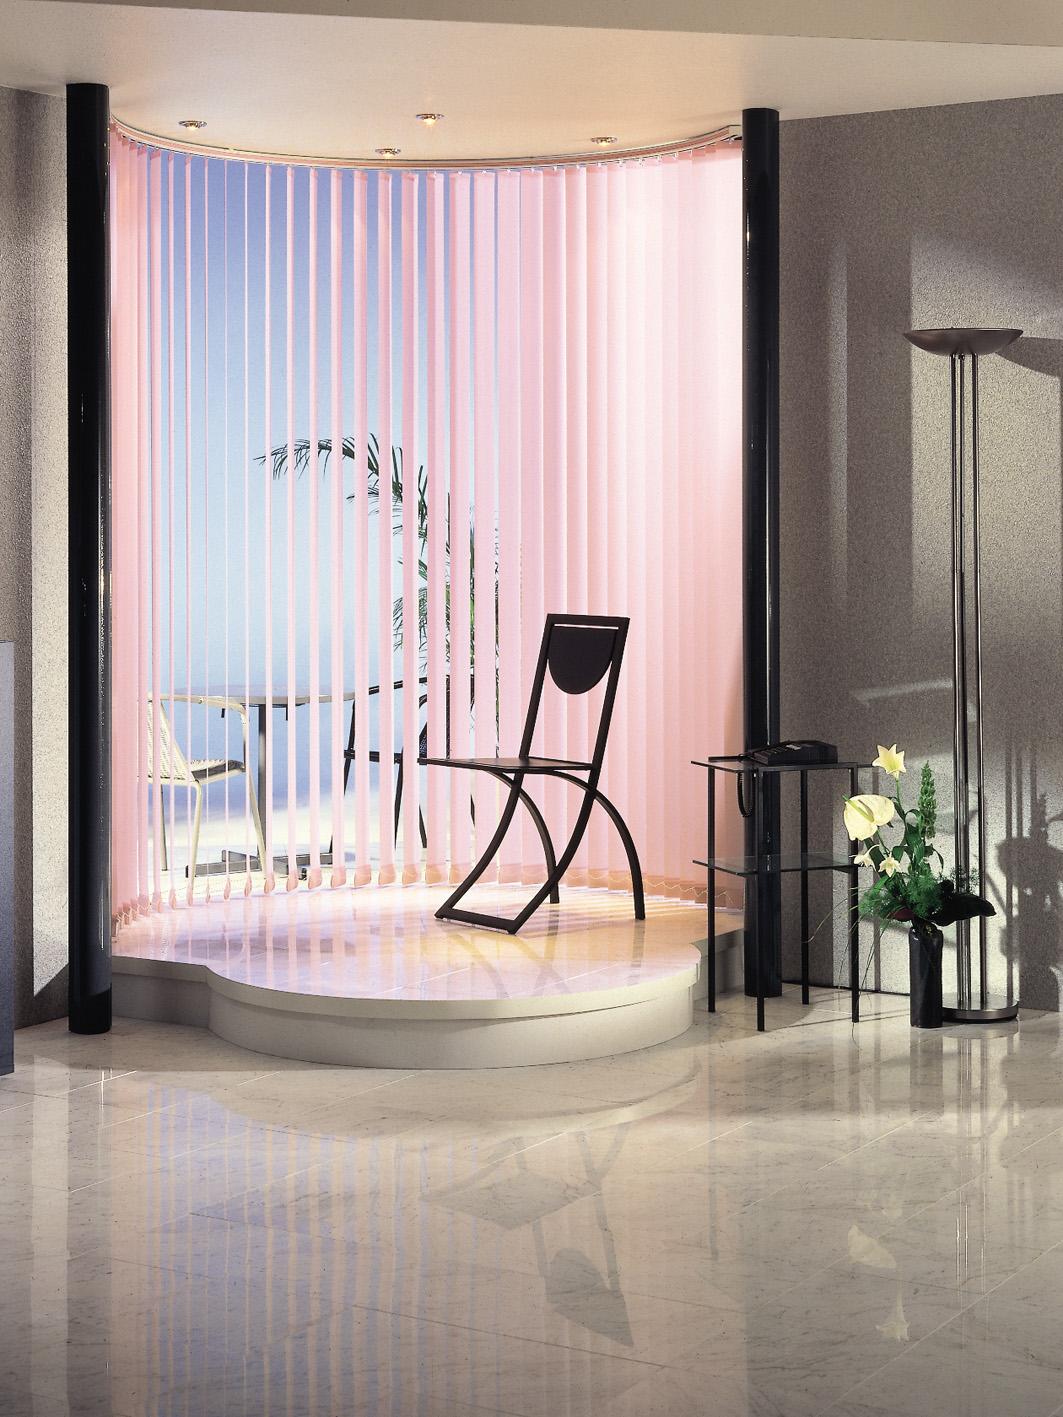 Homepage - Store lamelle verticale ikea ...